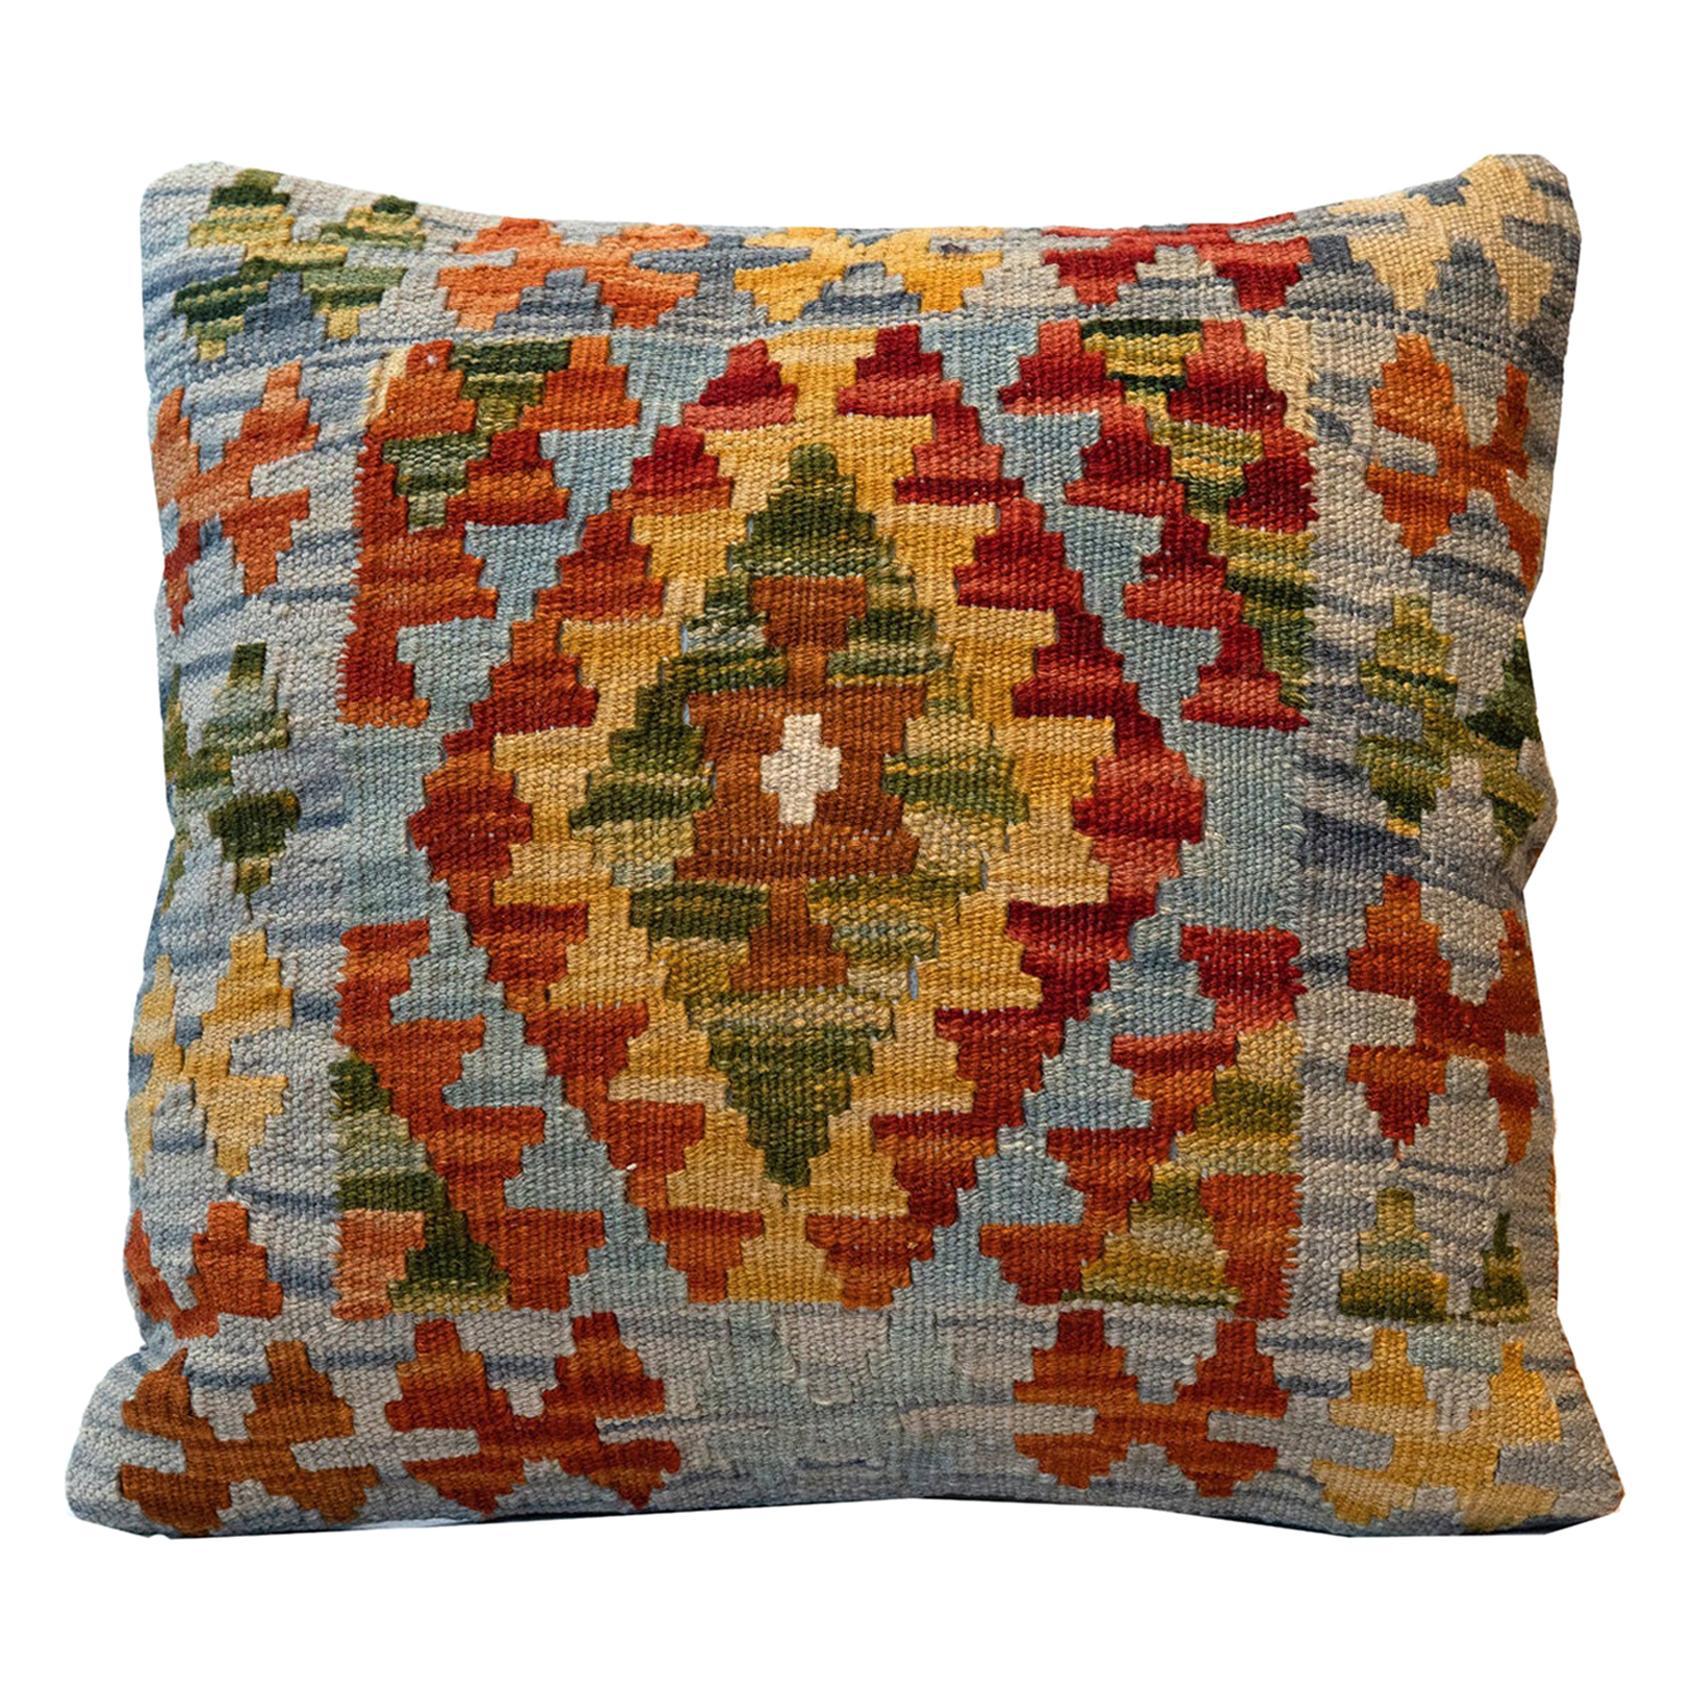 Handmade Pillow Case Geometric Cushion Cover Wool Zig - Zag